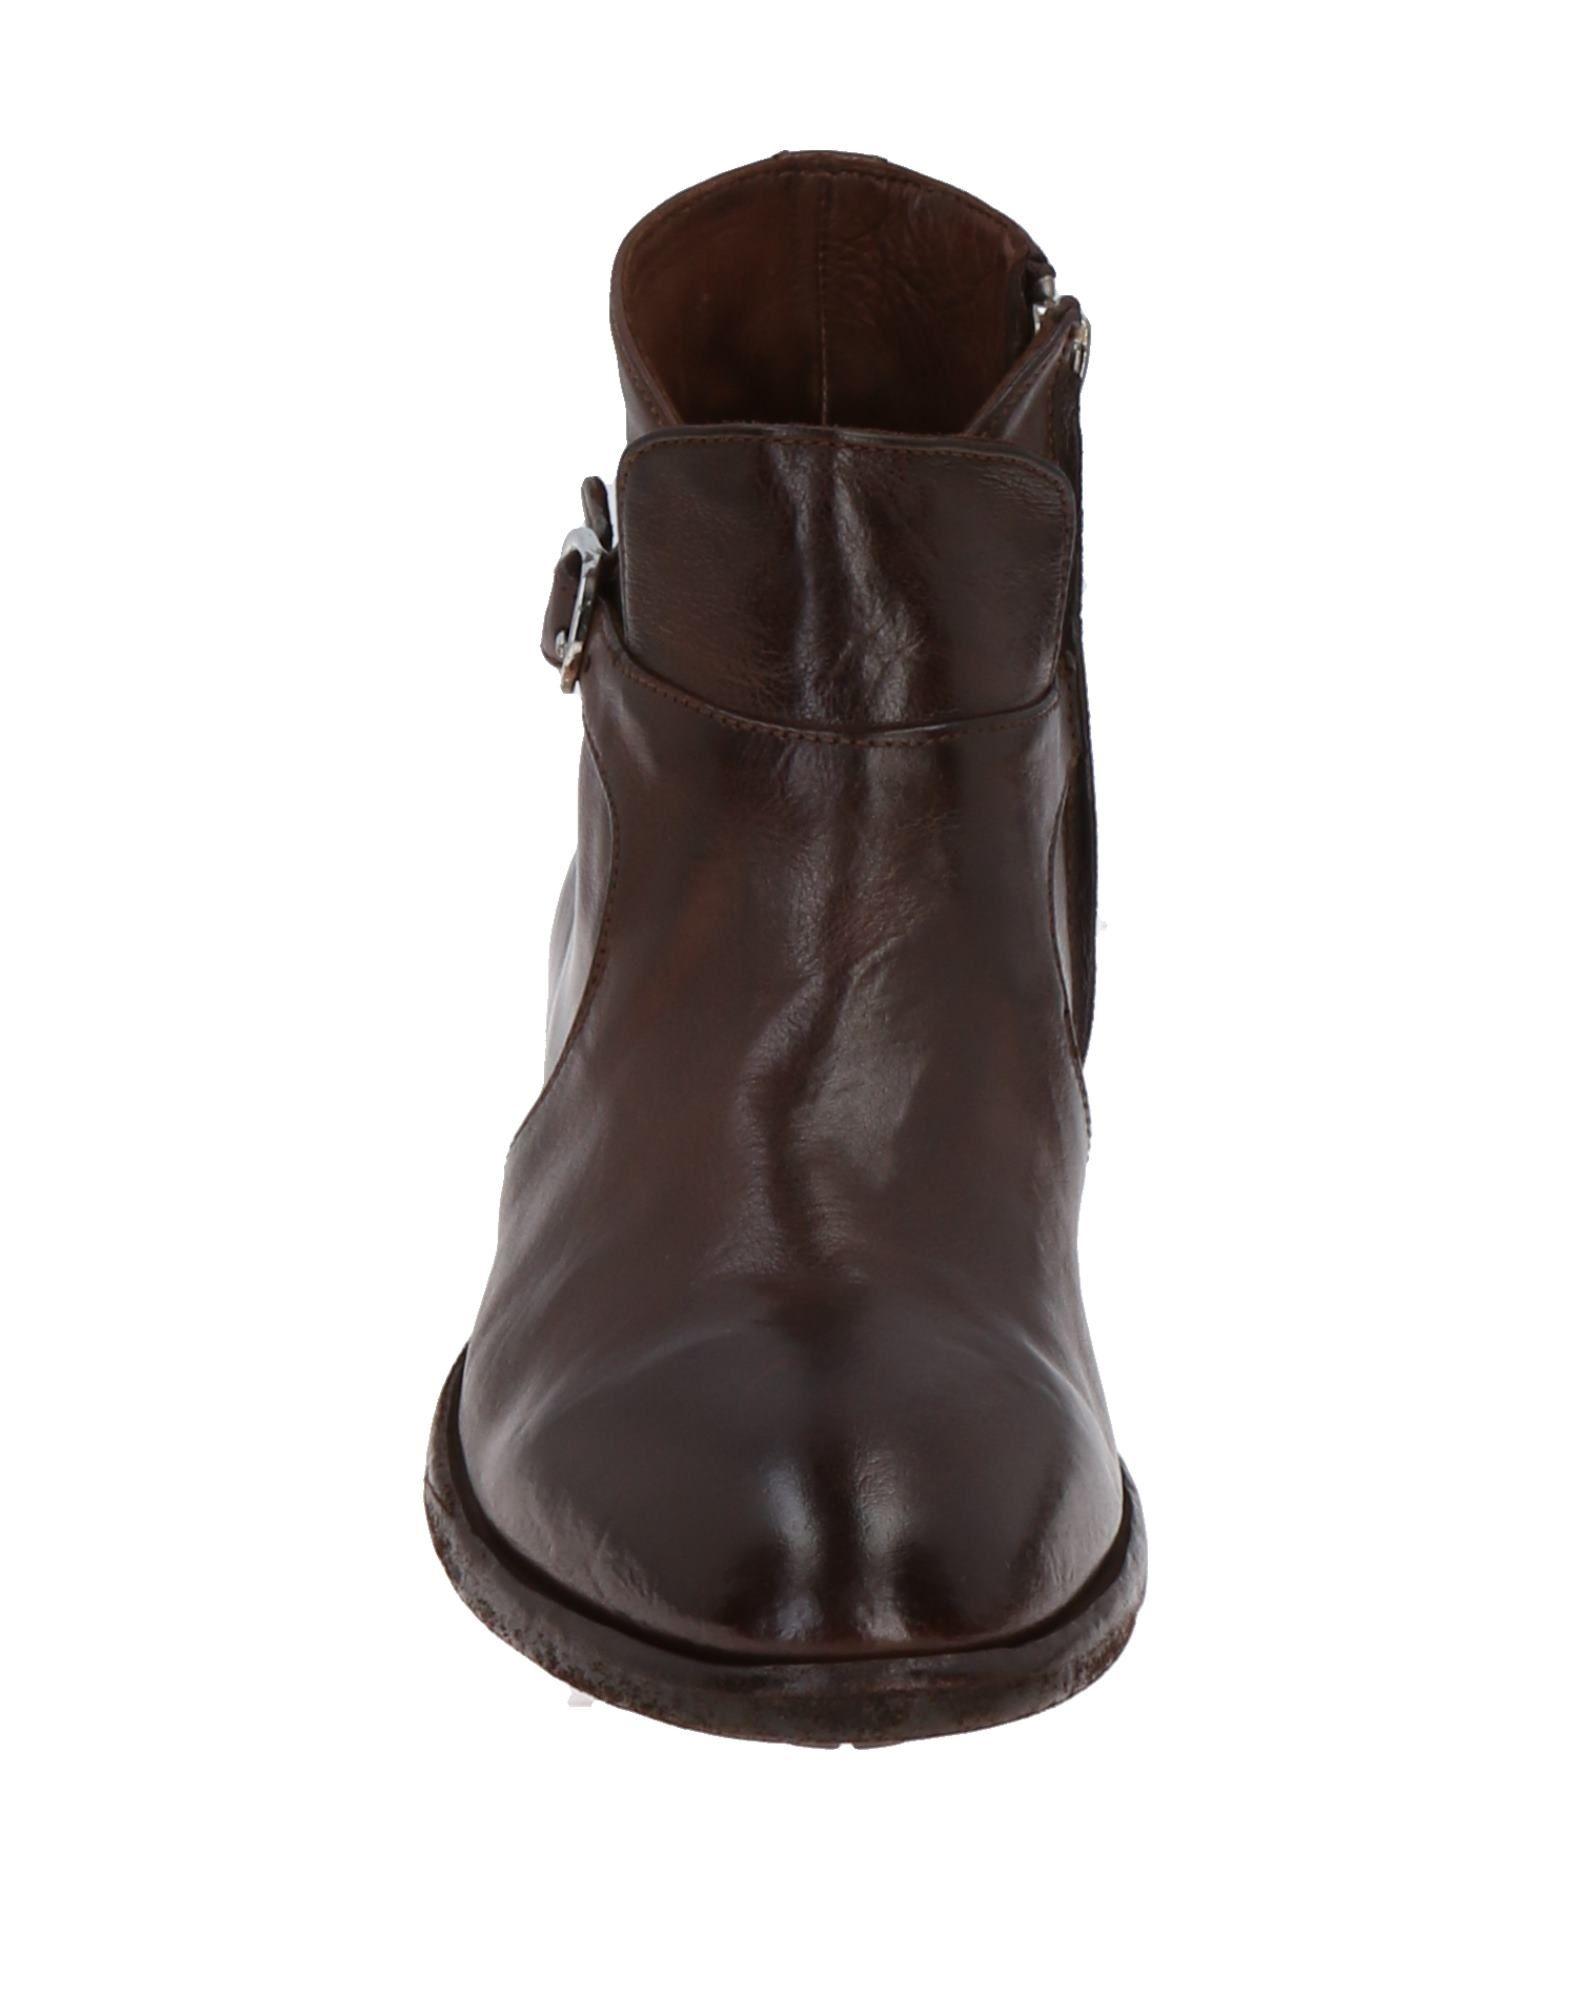 Rabatt Schuhe Officine Creative Italia 11285188NV Stiefelette Damen  11285188NV Italia 0b7c74